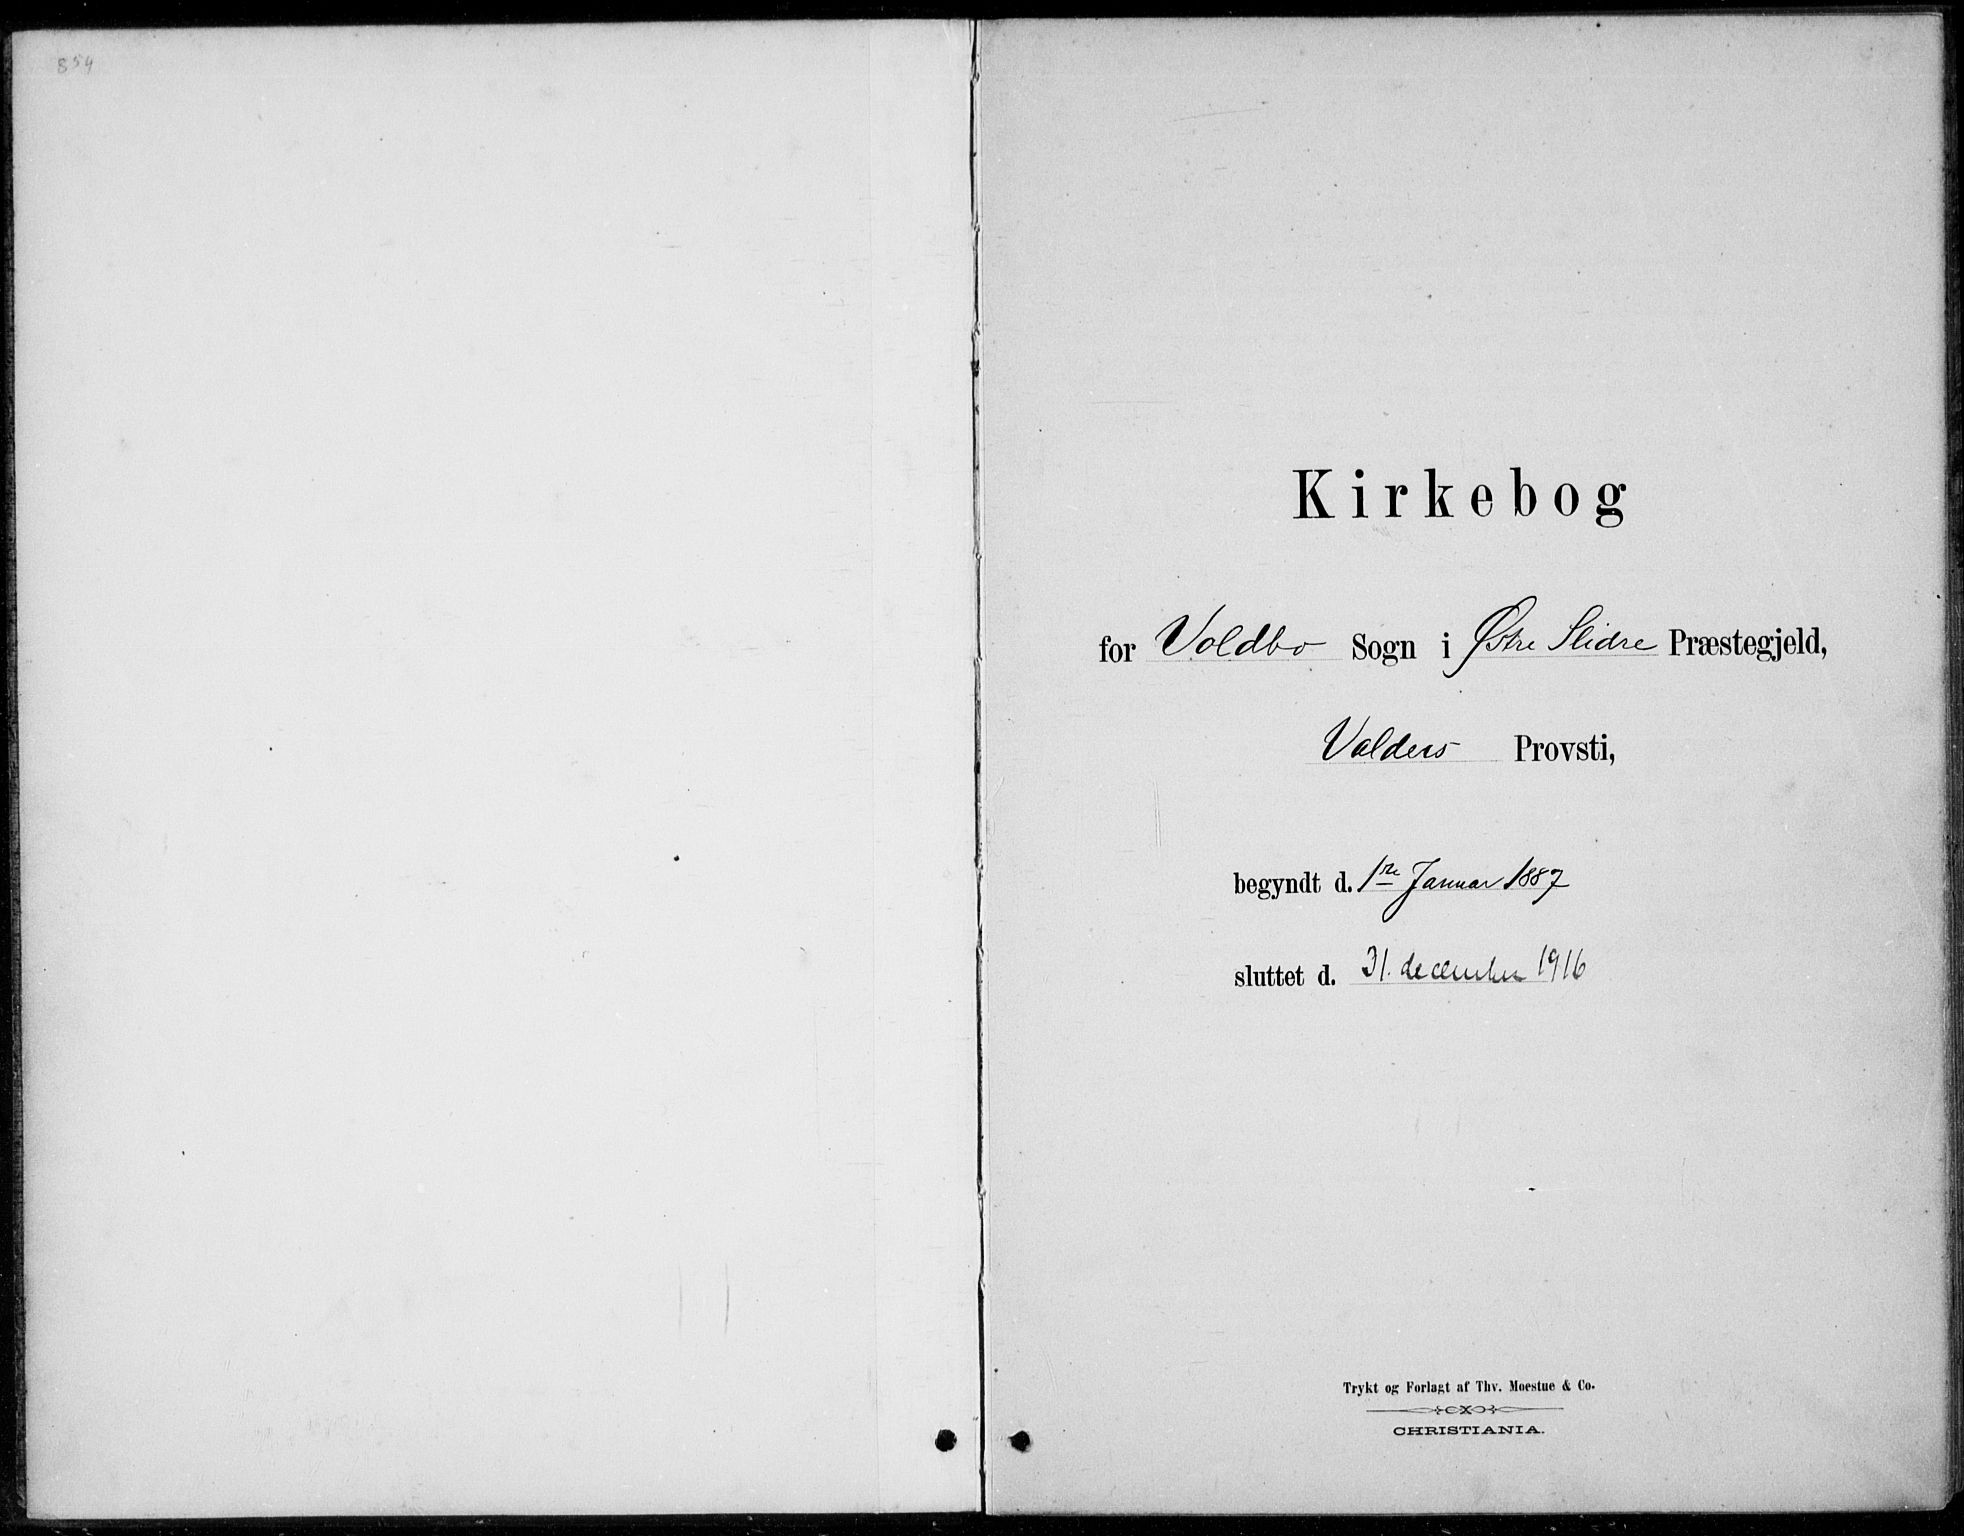 SAH, Øystre Slidre prestekontor, Ministerialbok nr. 5, 1887-1916